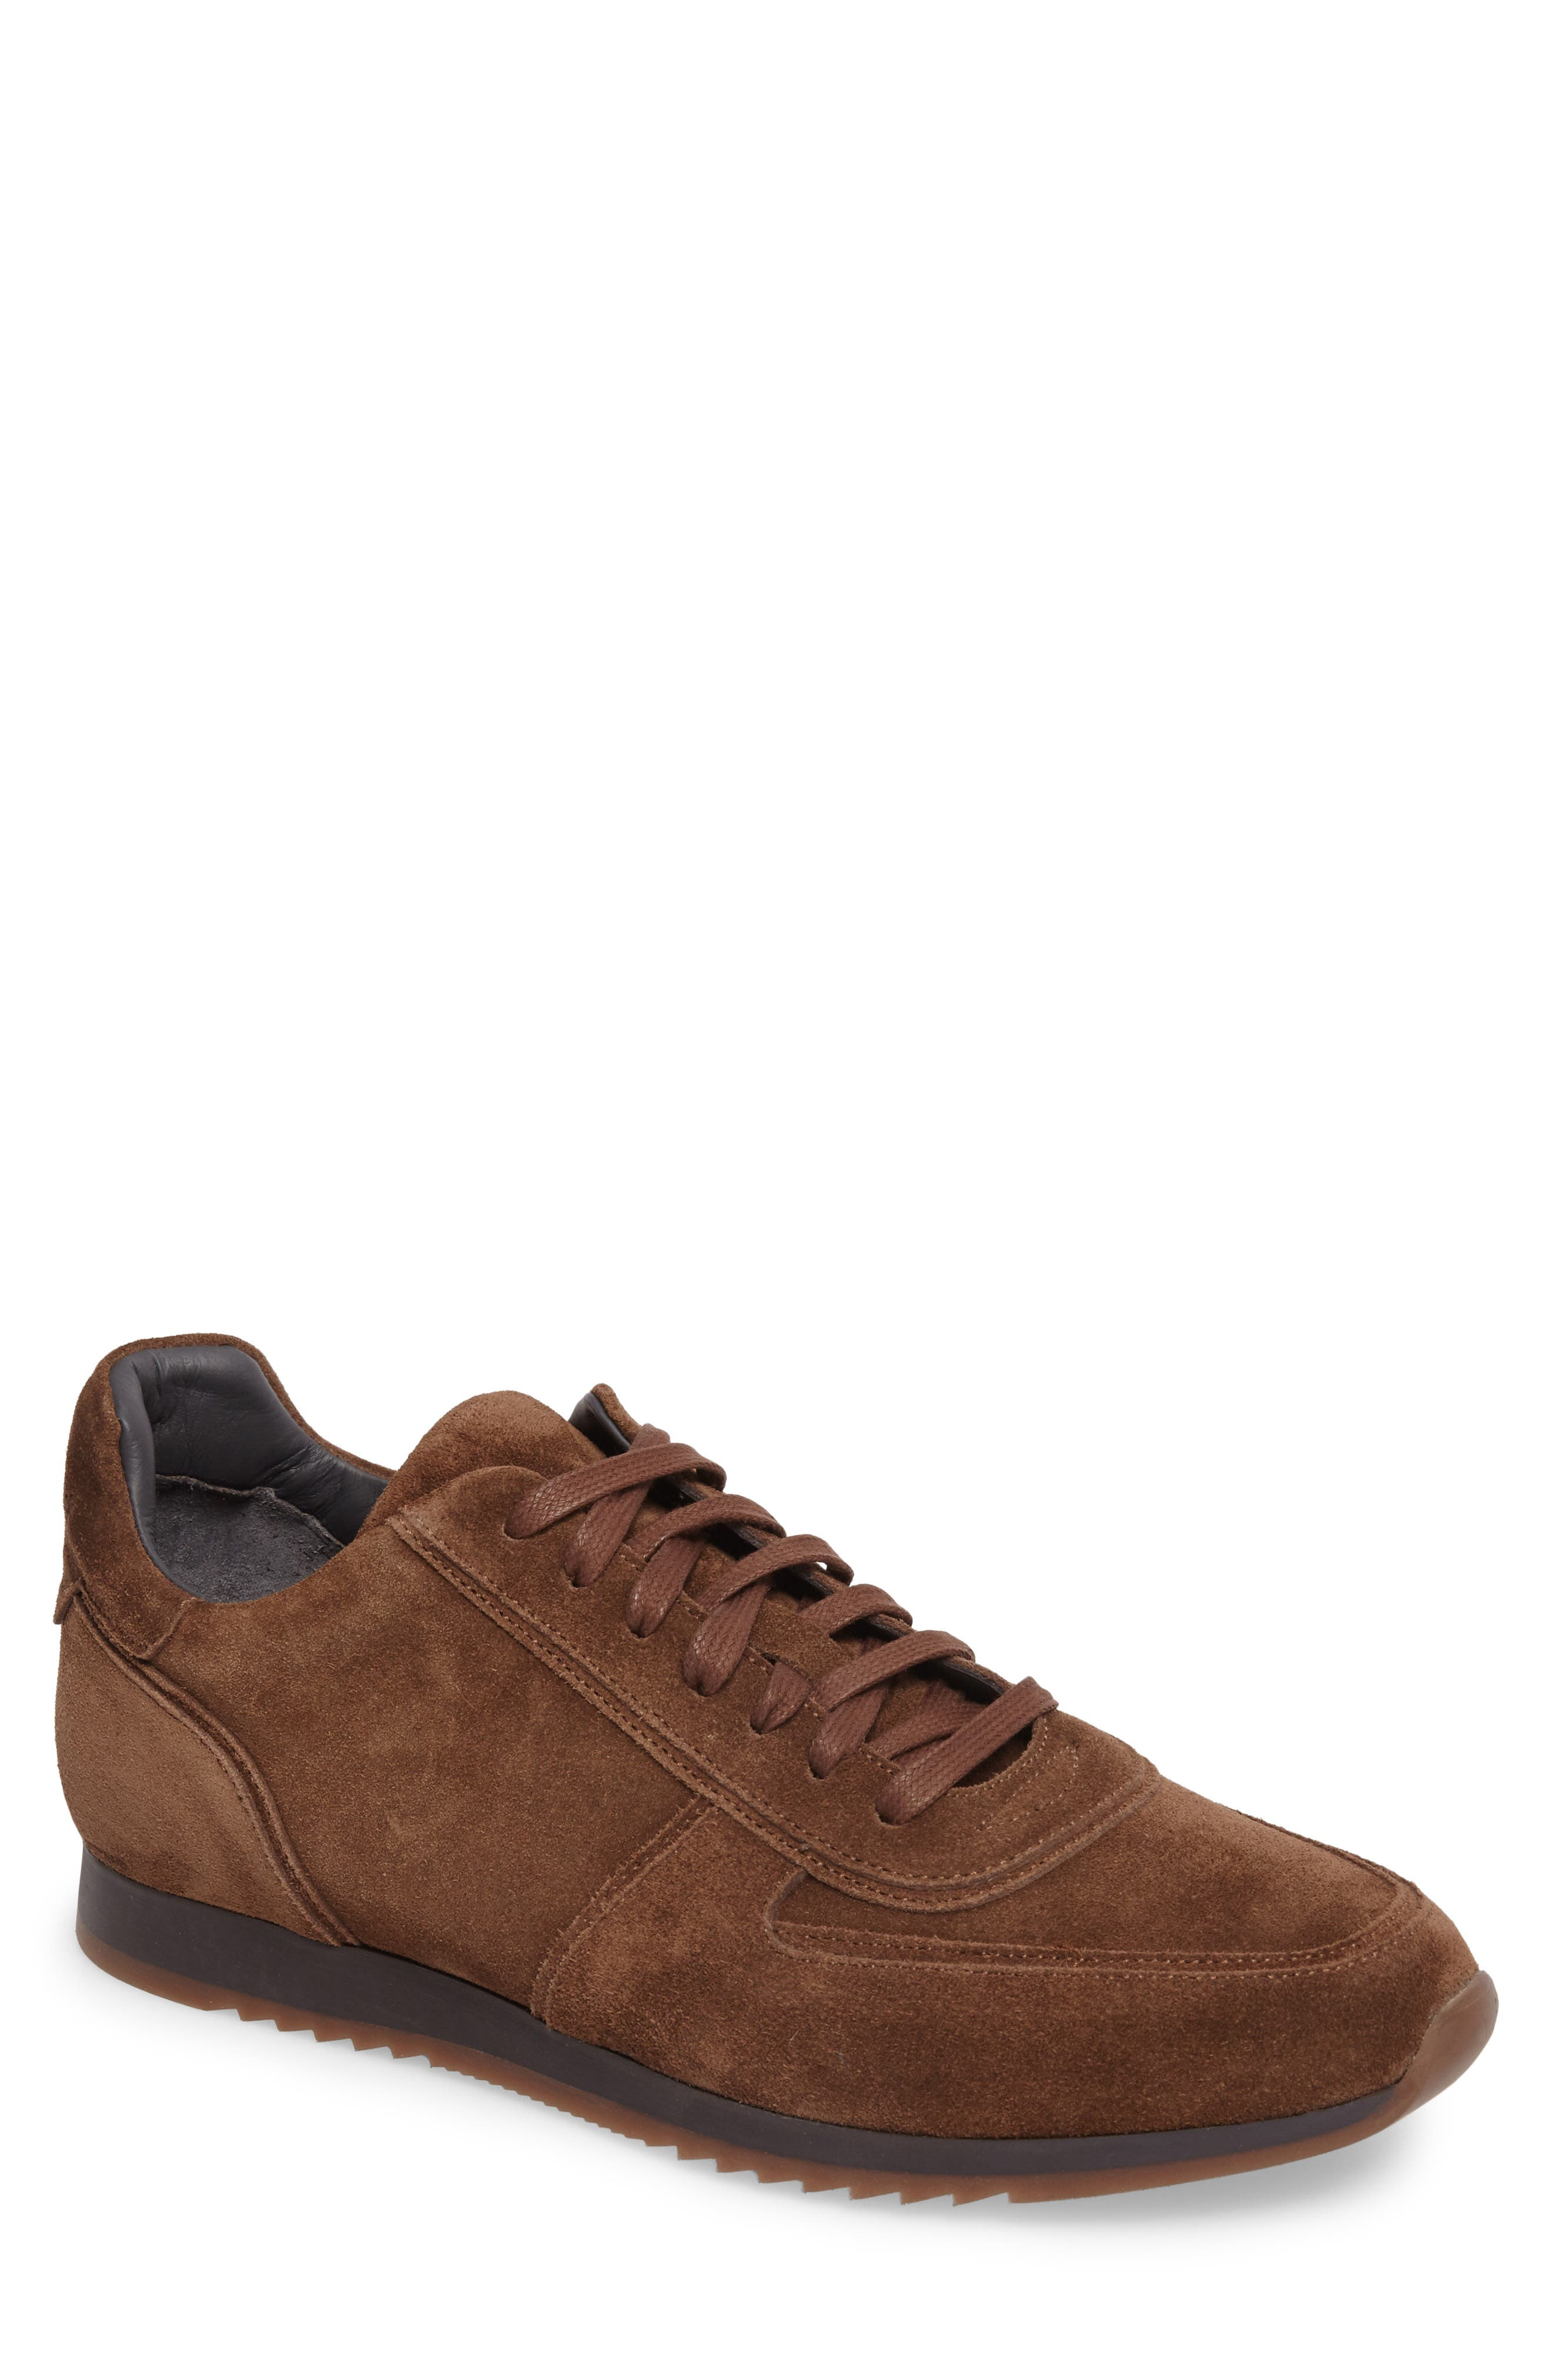 Hatton Sneaker,                             Main thumbnail 1, color,                             Softy Marrone